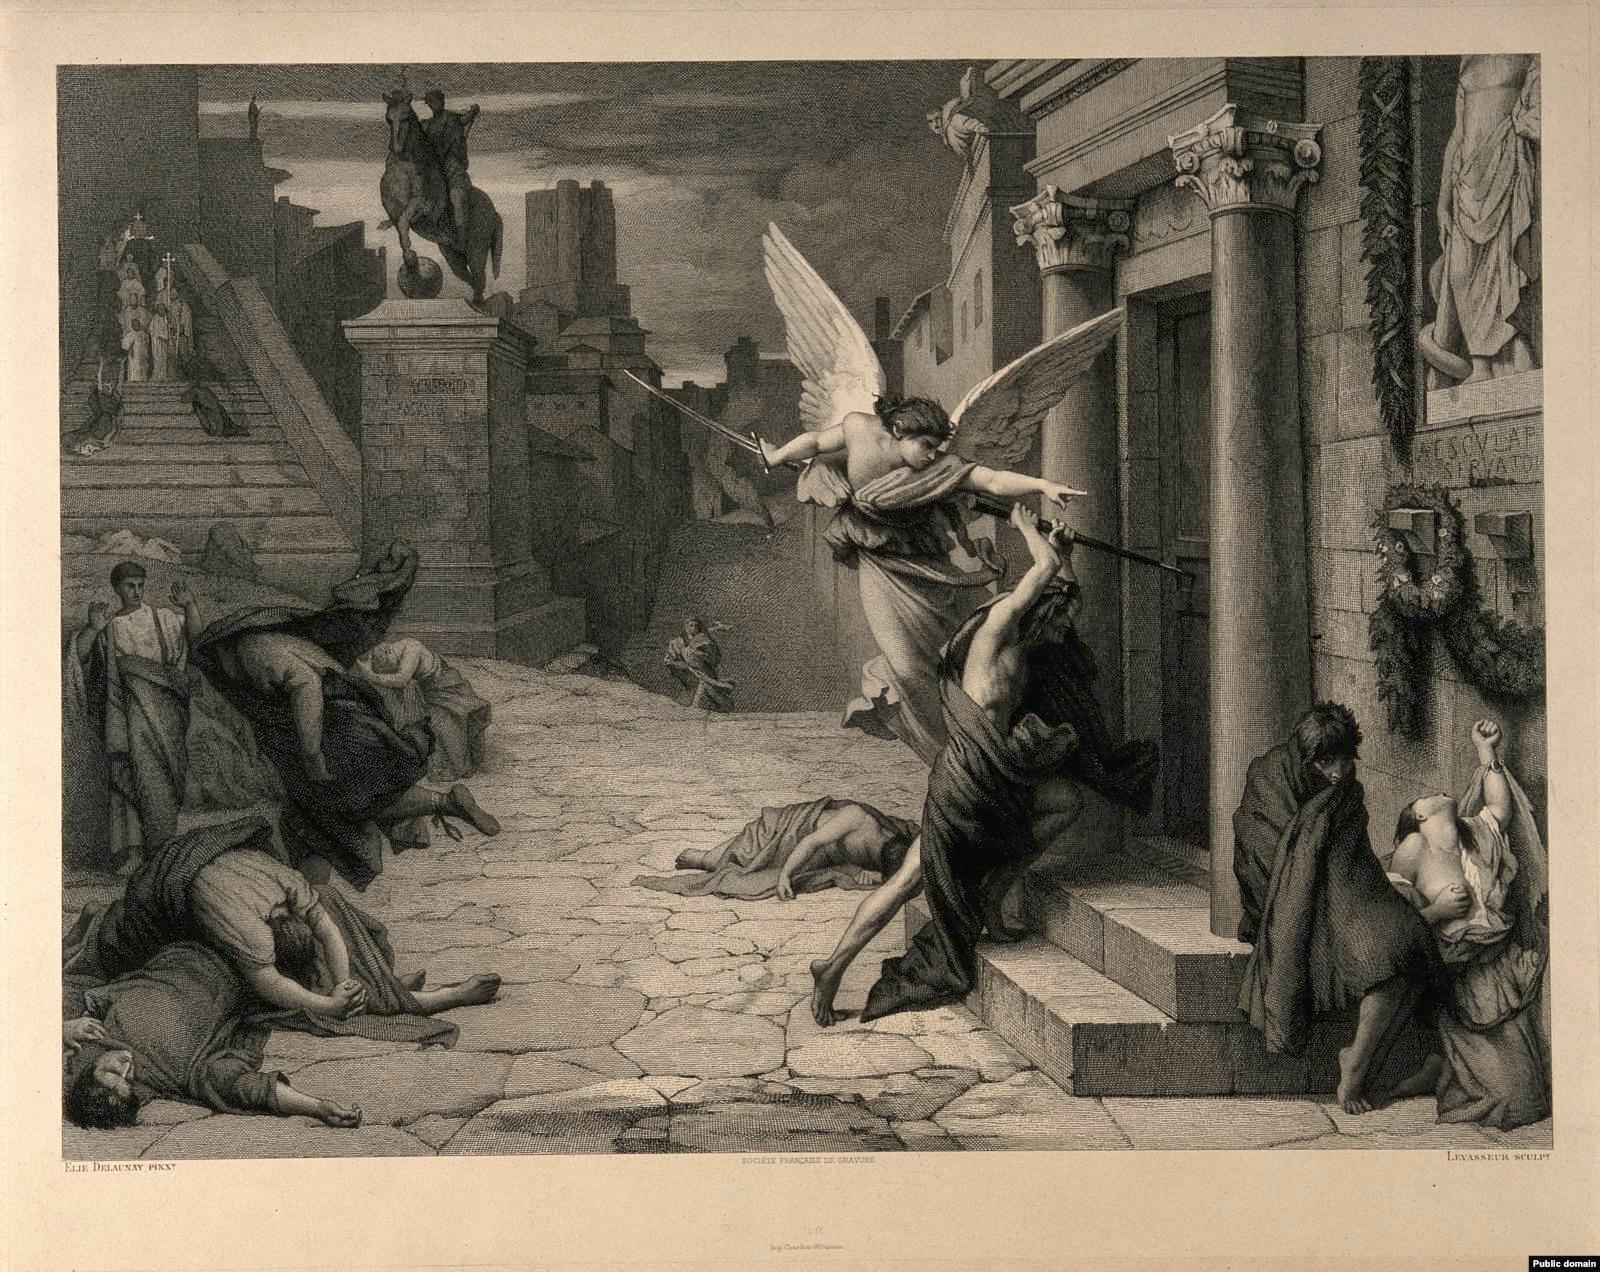 Antonininijeva kuga, Jules-Elie Delaunay